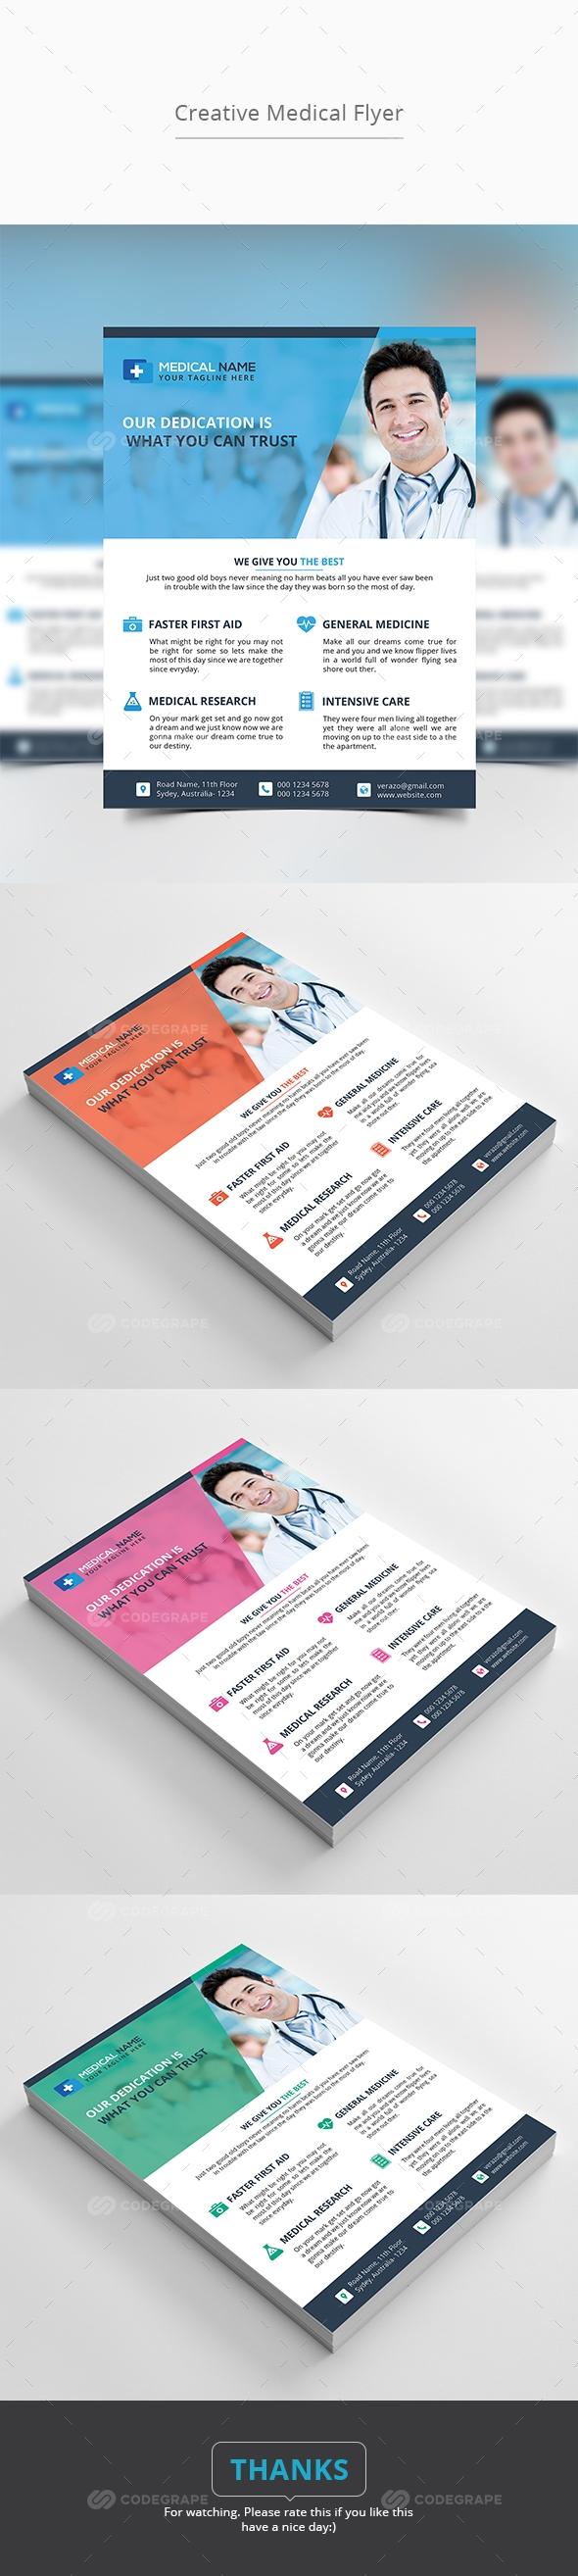 Creative Medical Flyer